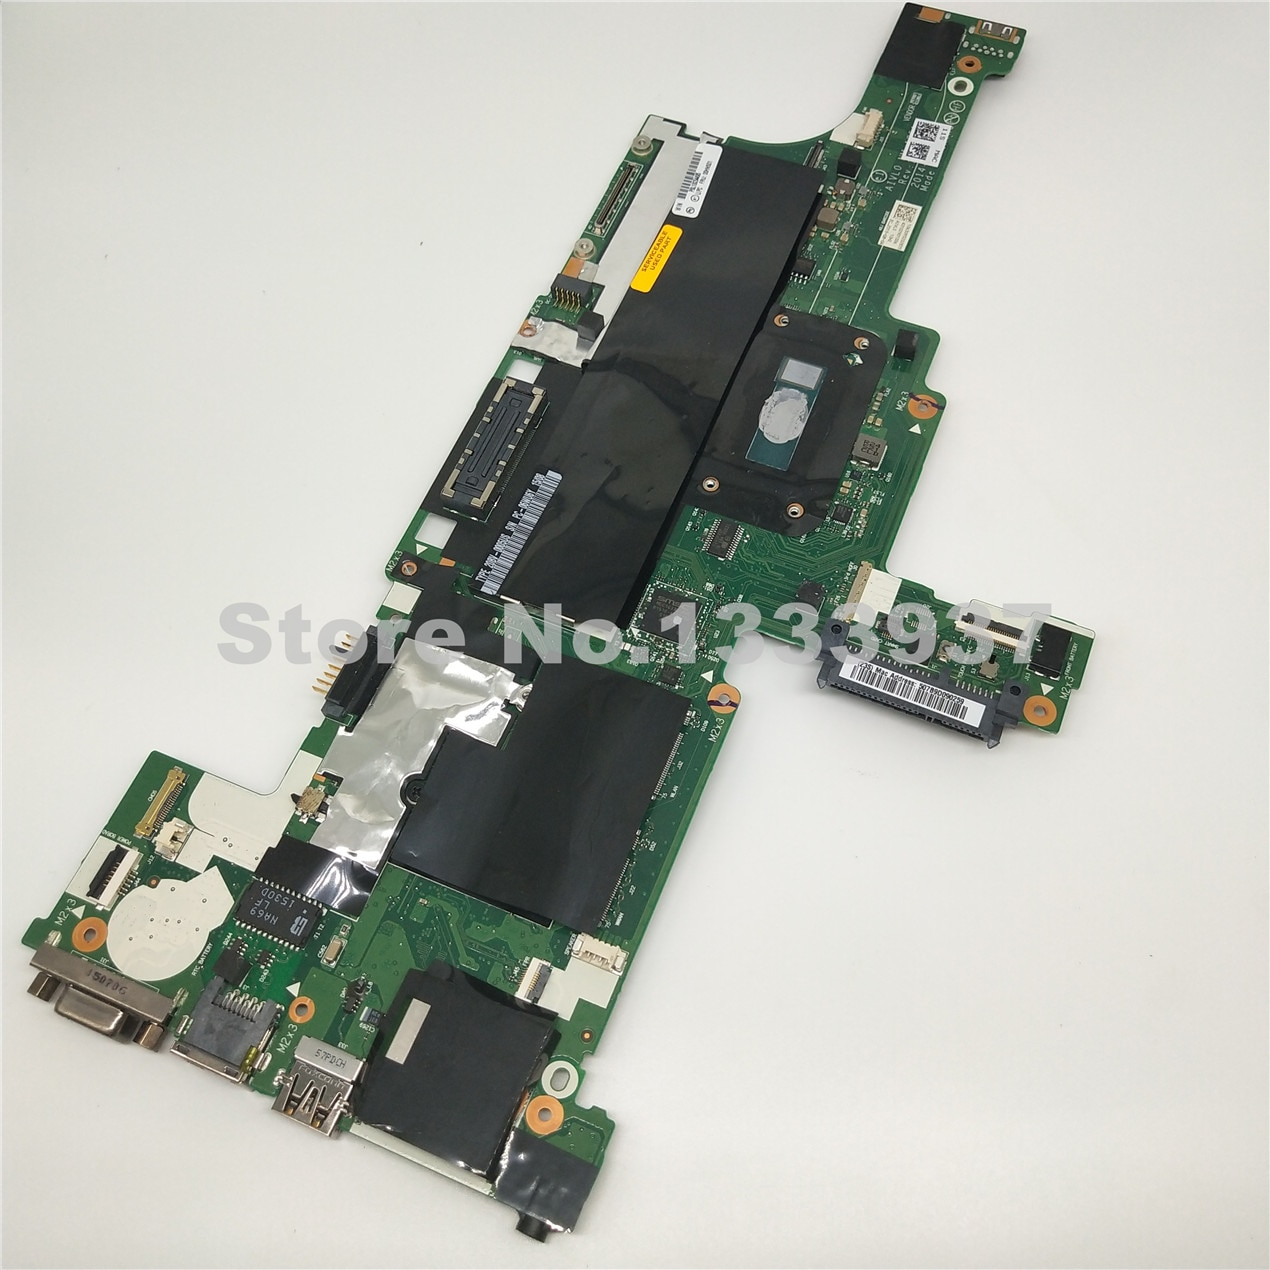 T450 i5-5200u Para Lenovo T450 00HN501 Para ThinkPad Laptop Motherboard AIVL0 NM-A251 DDR3L mainboard